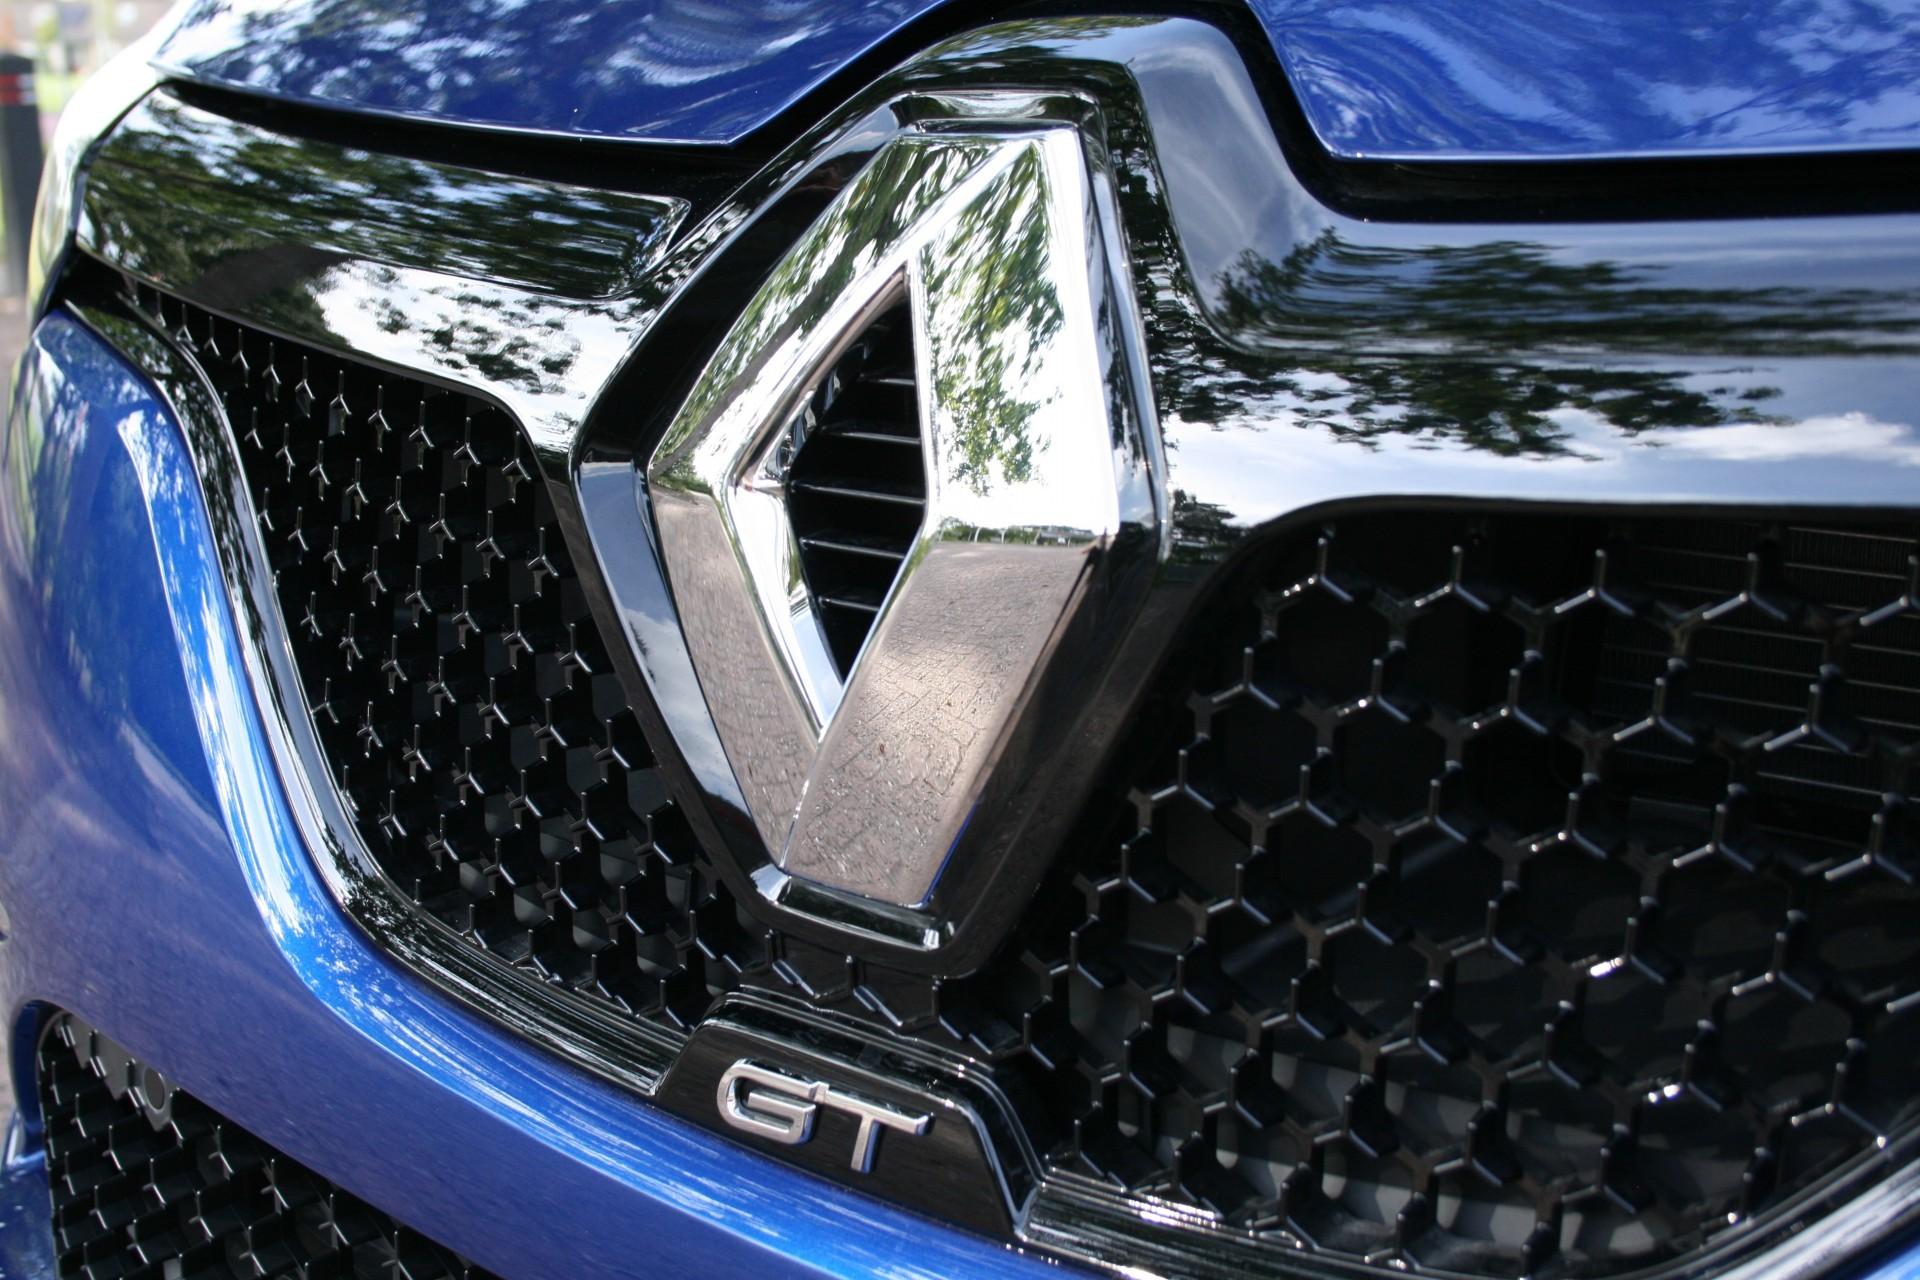 Renault Mégane foto 6